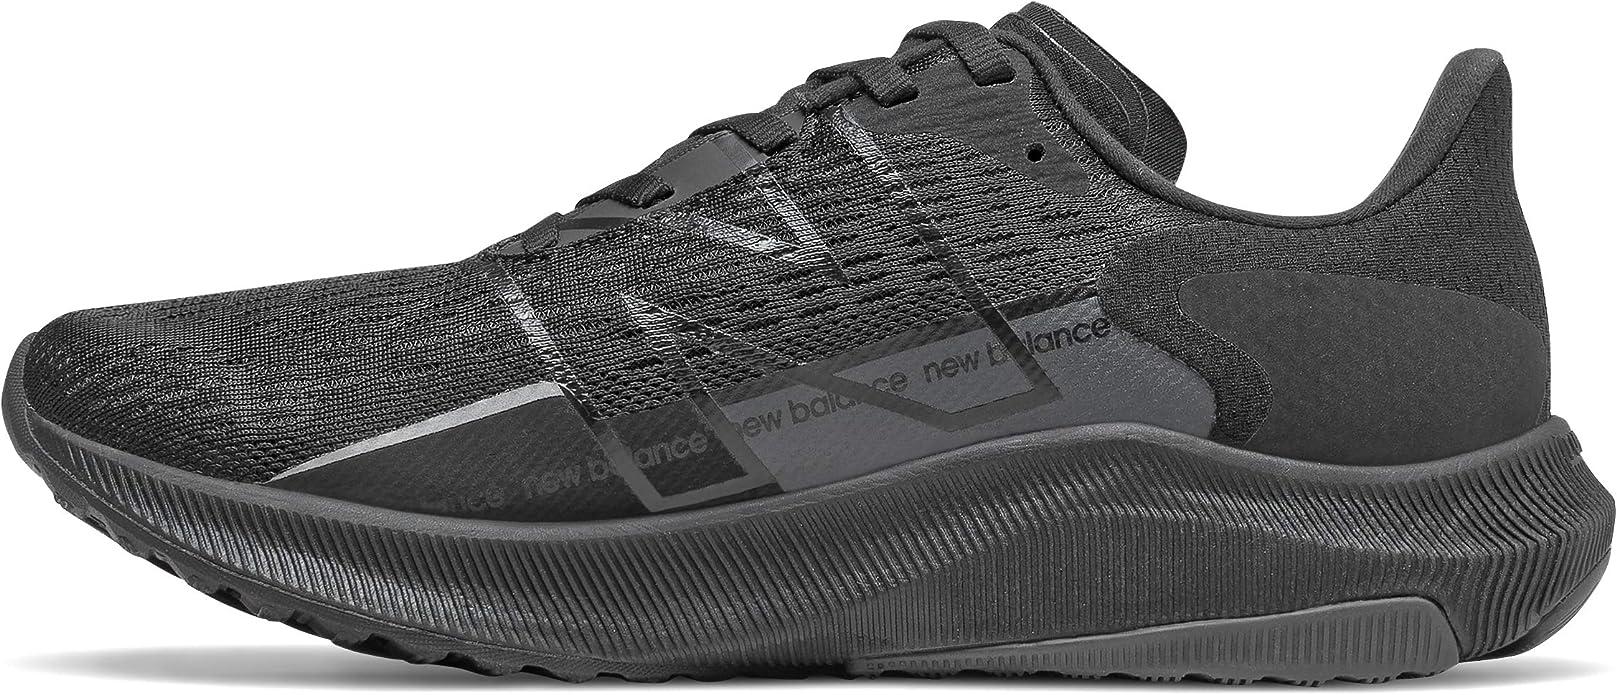 New Balance Women's FuelCell Propel V2 Running Shoe   Amazon